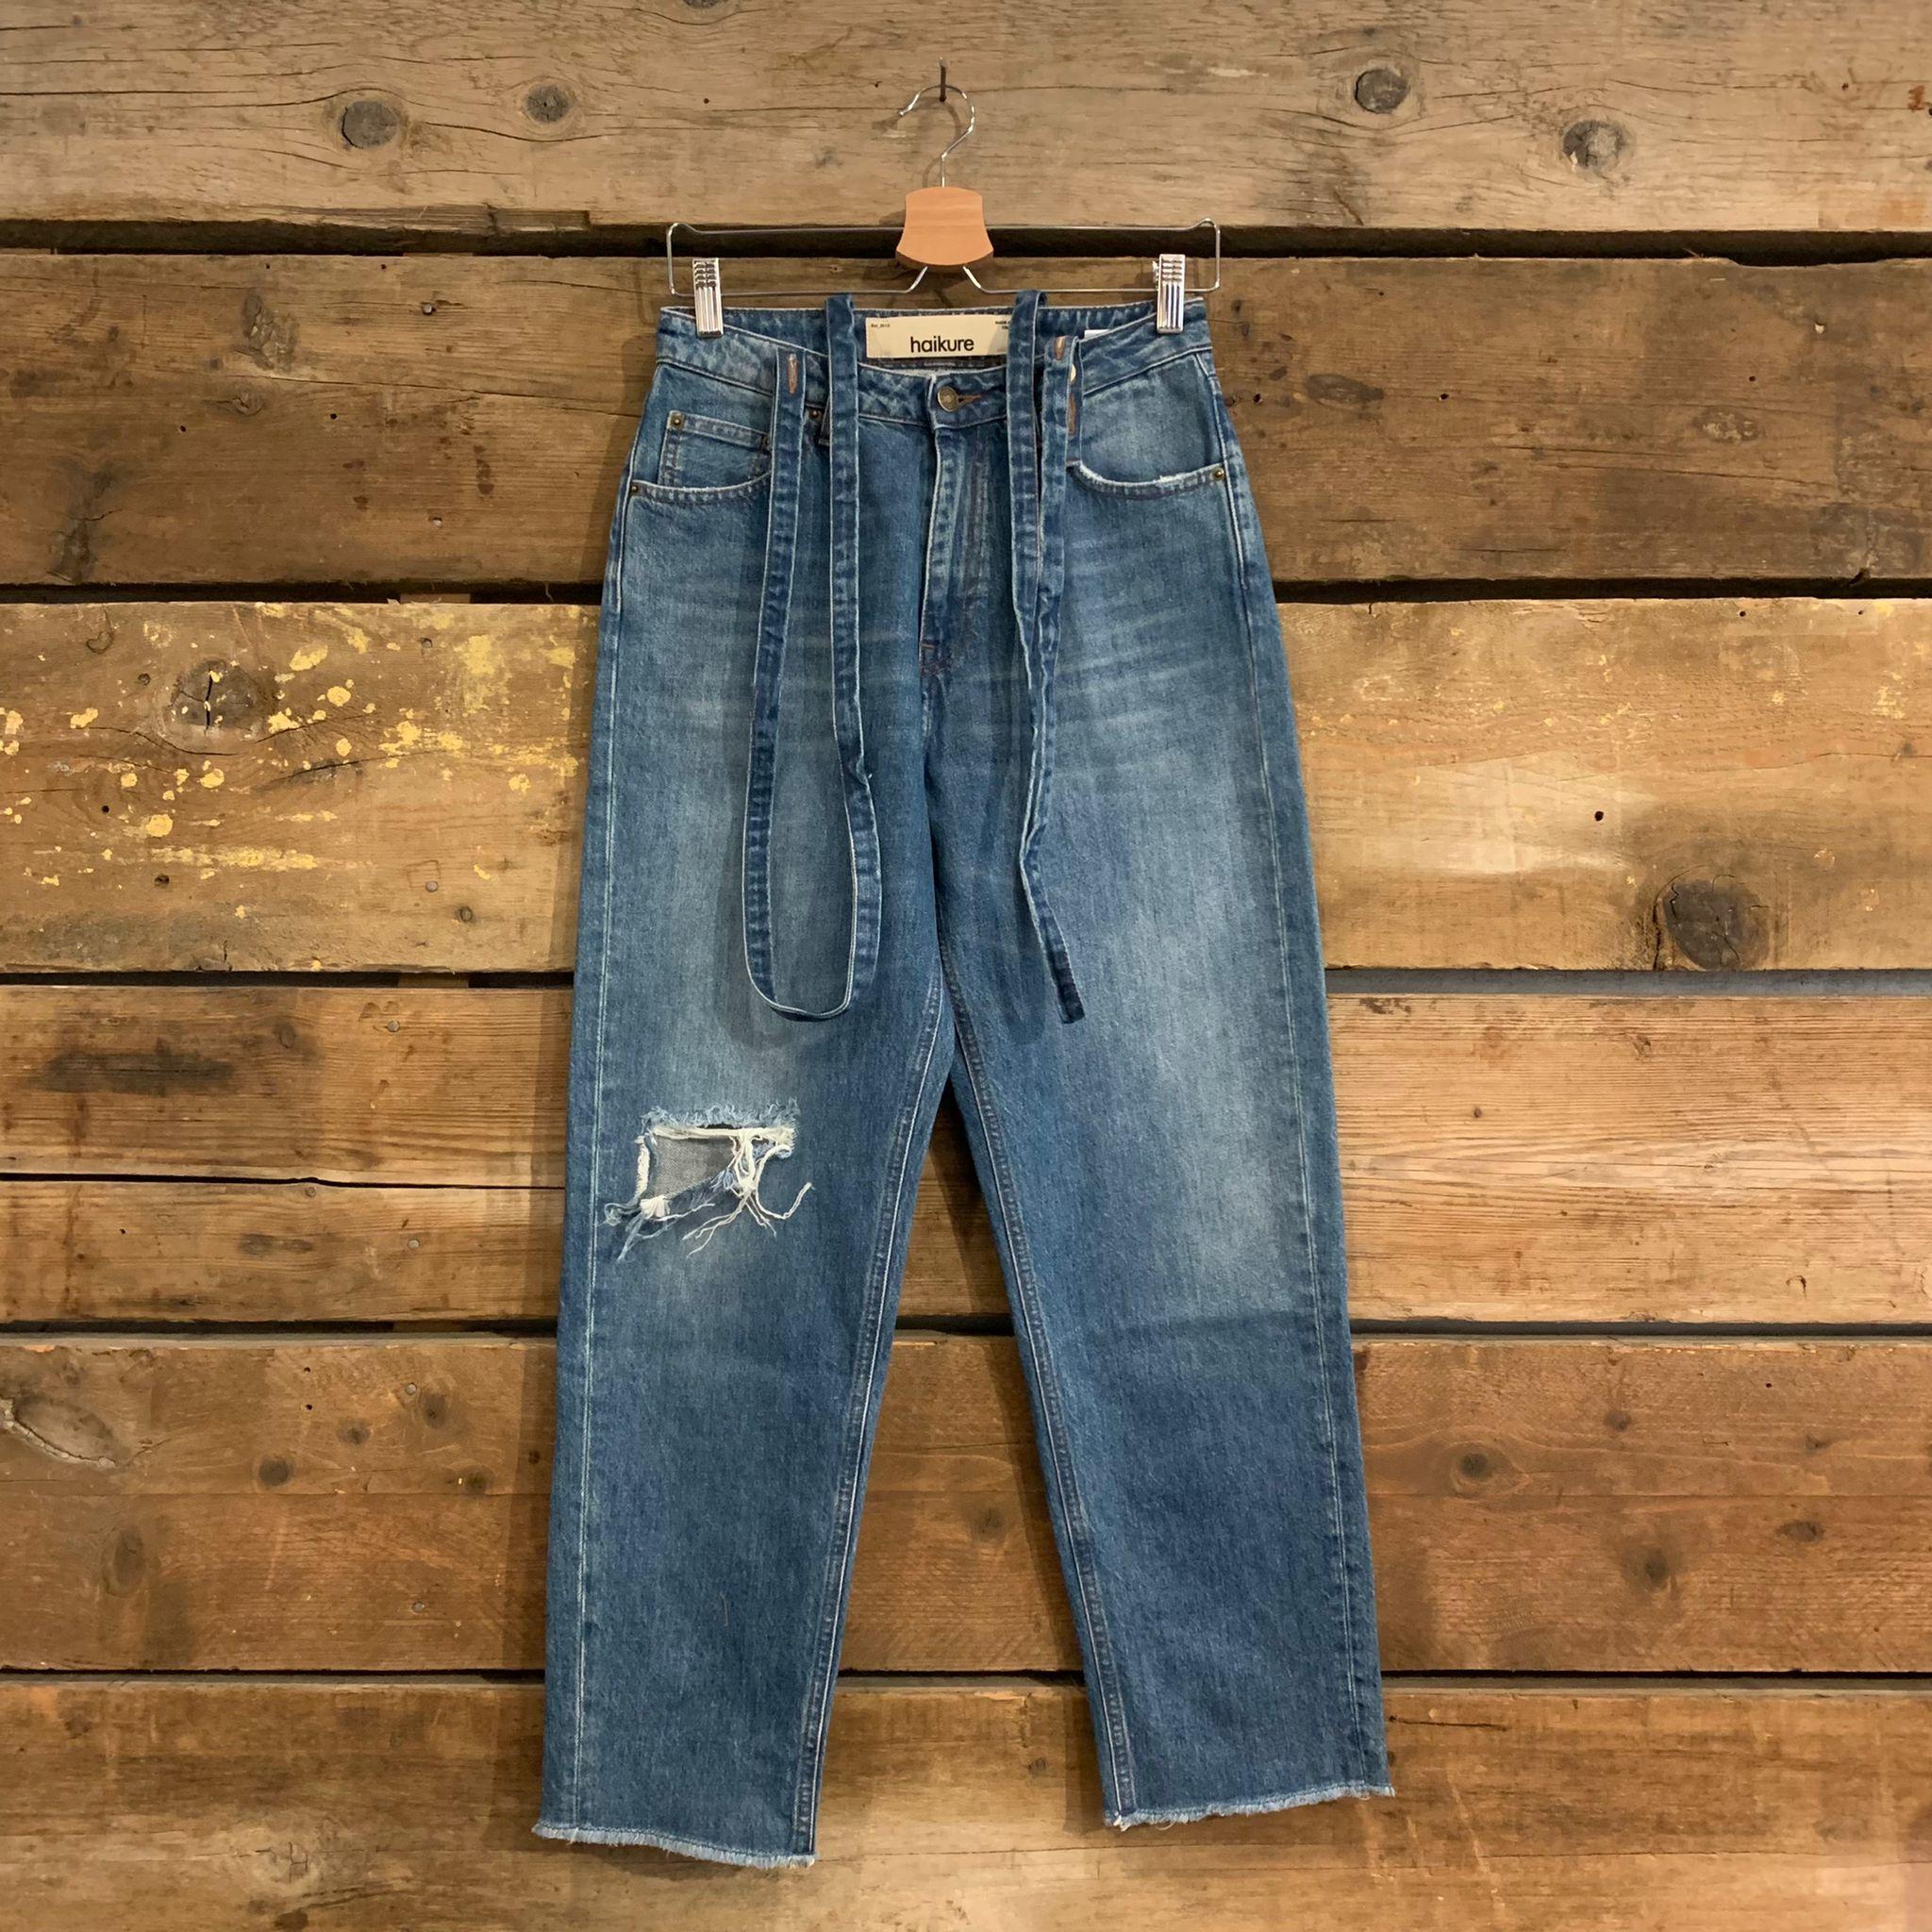 Jeans Haikure Donna Illinois Early Blue Epoch Medium Destroy Con Bretelle Removibili